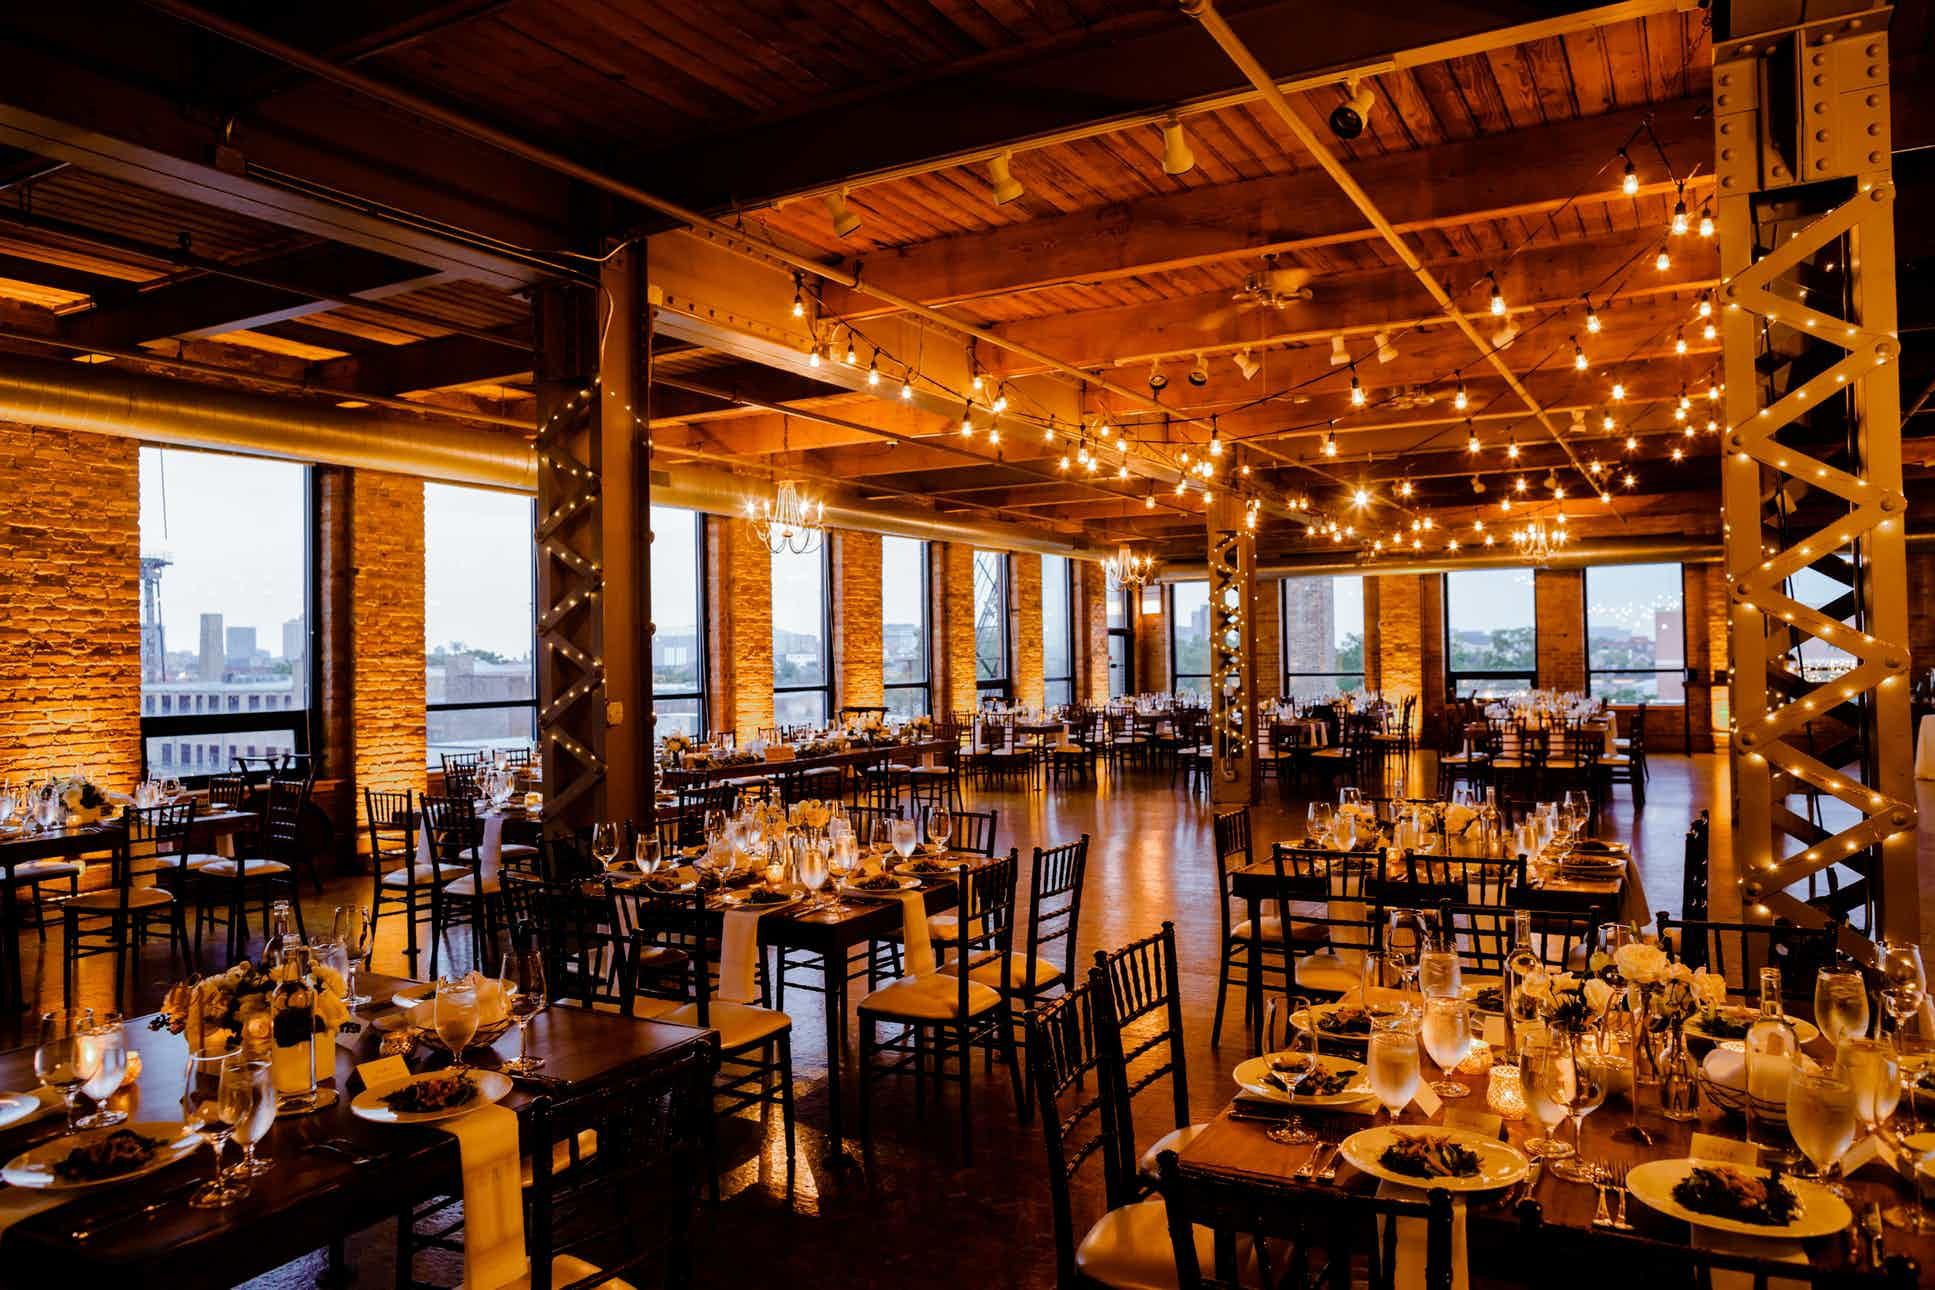 City View Loft Downtown Chicago Wedding Venue Chicago